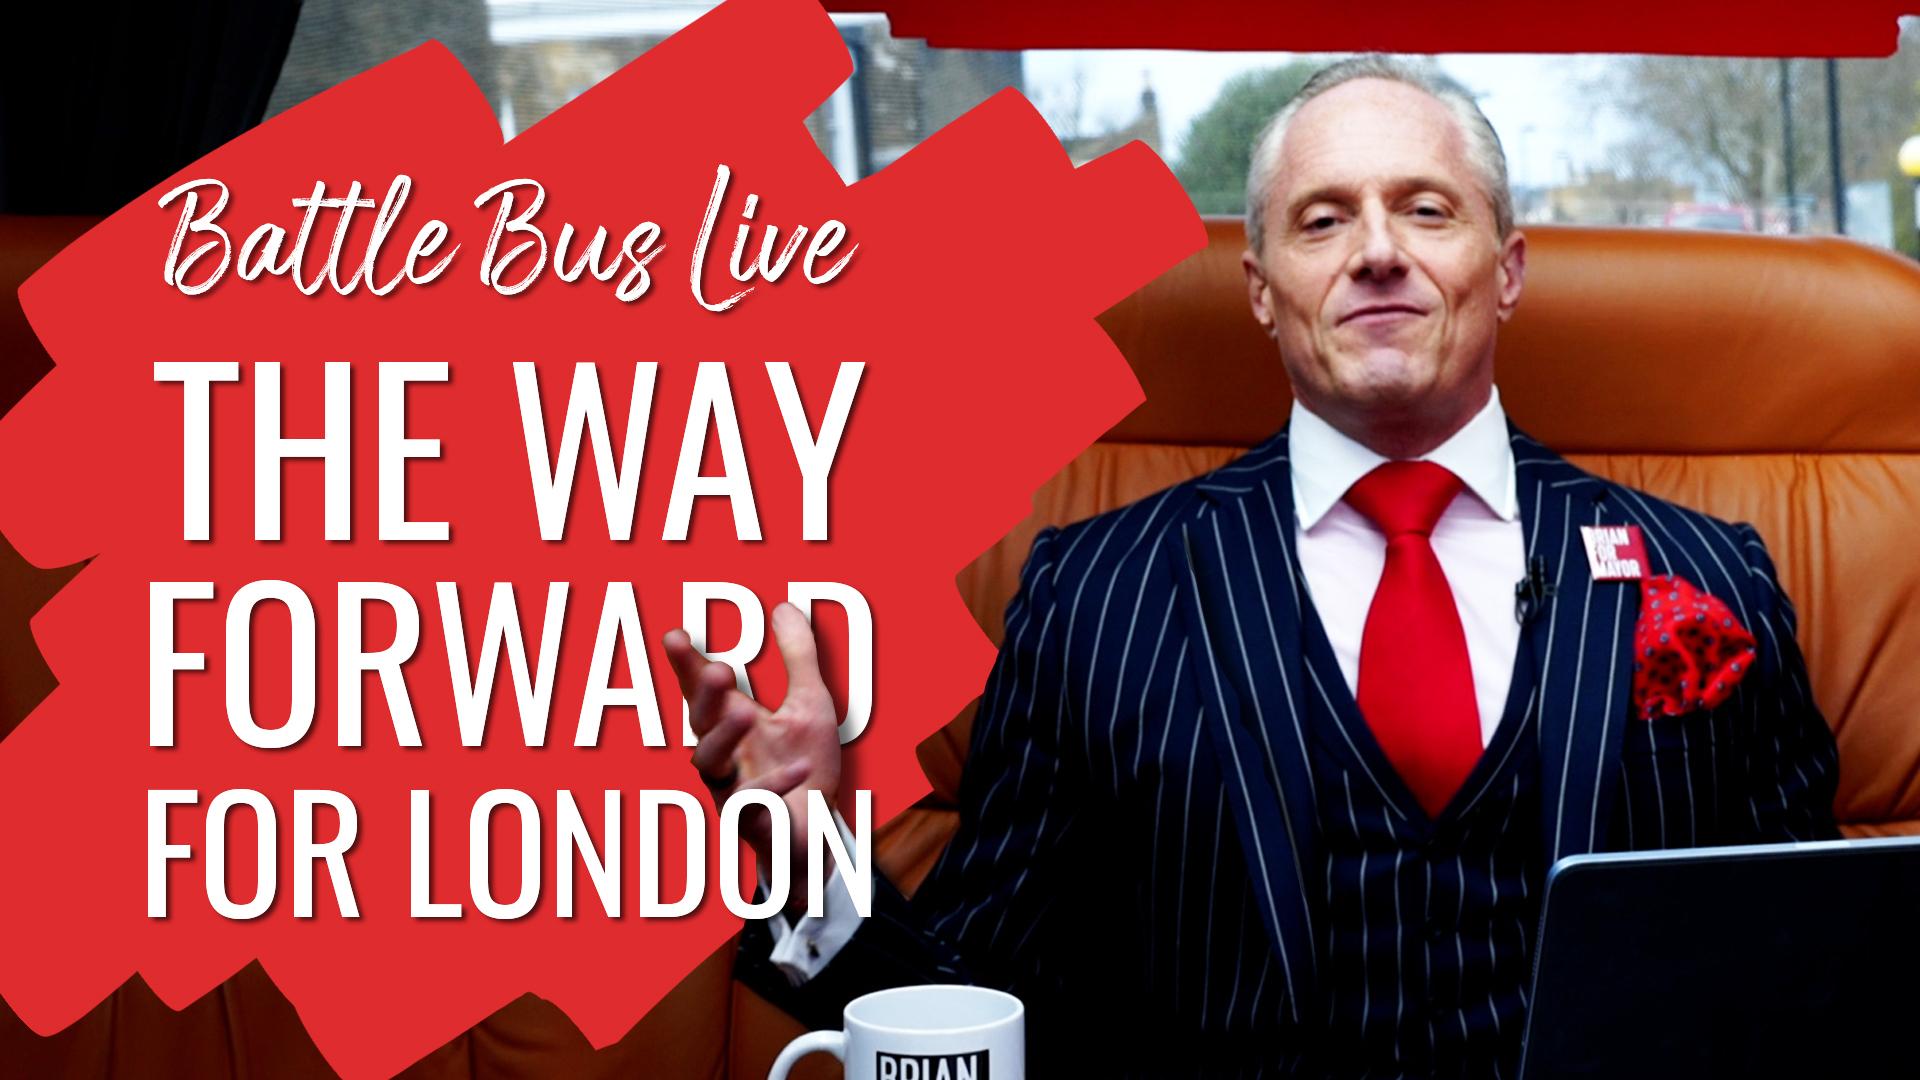 Lewisham - Digital Battle Bus Tour